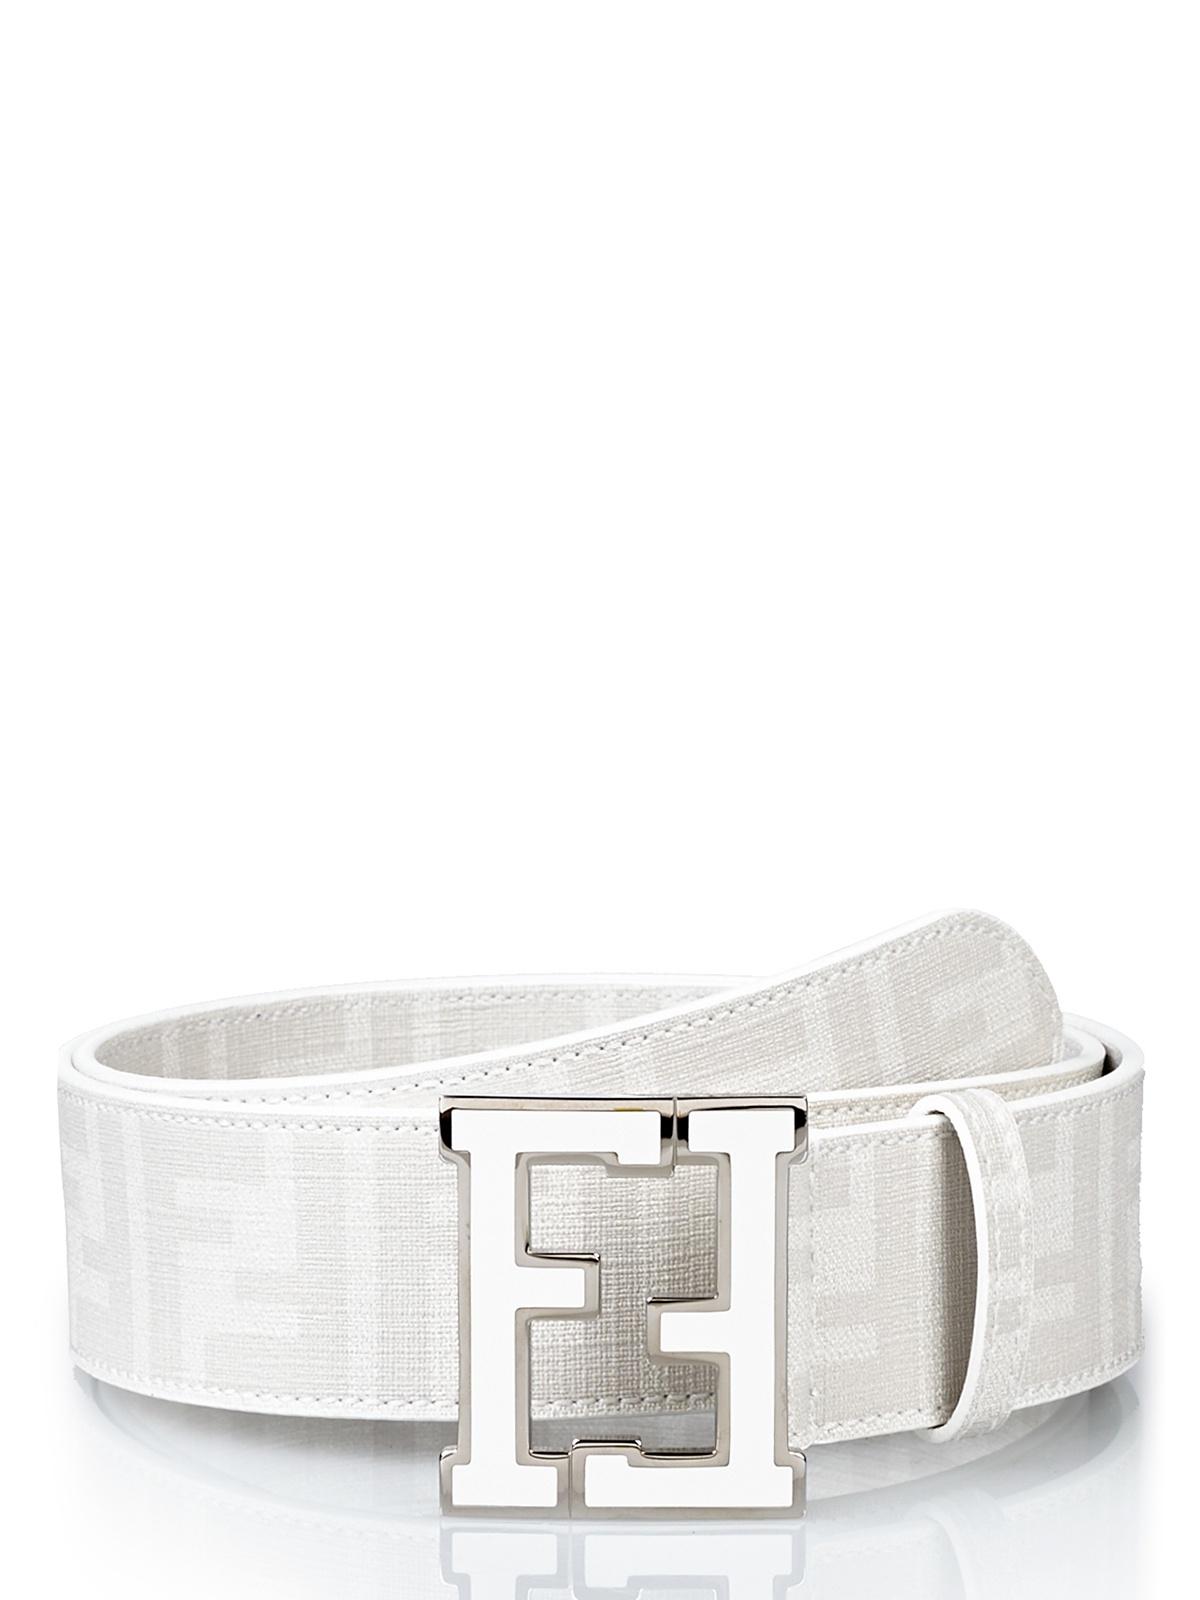 Fendi Belt In White Lyst